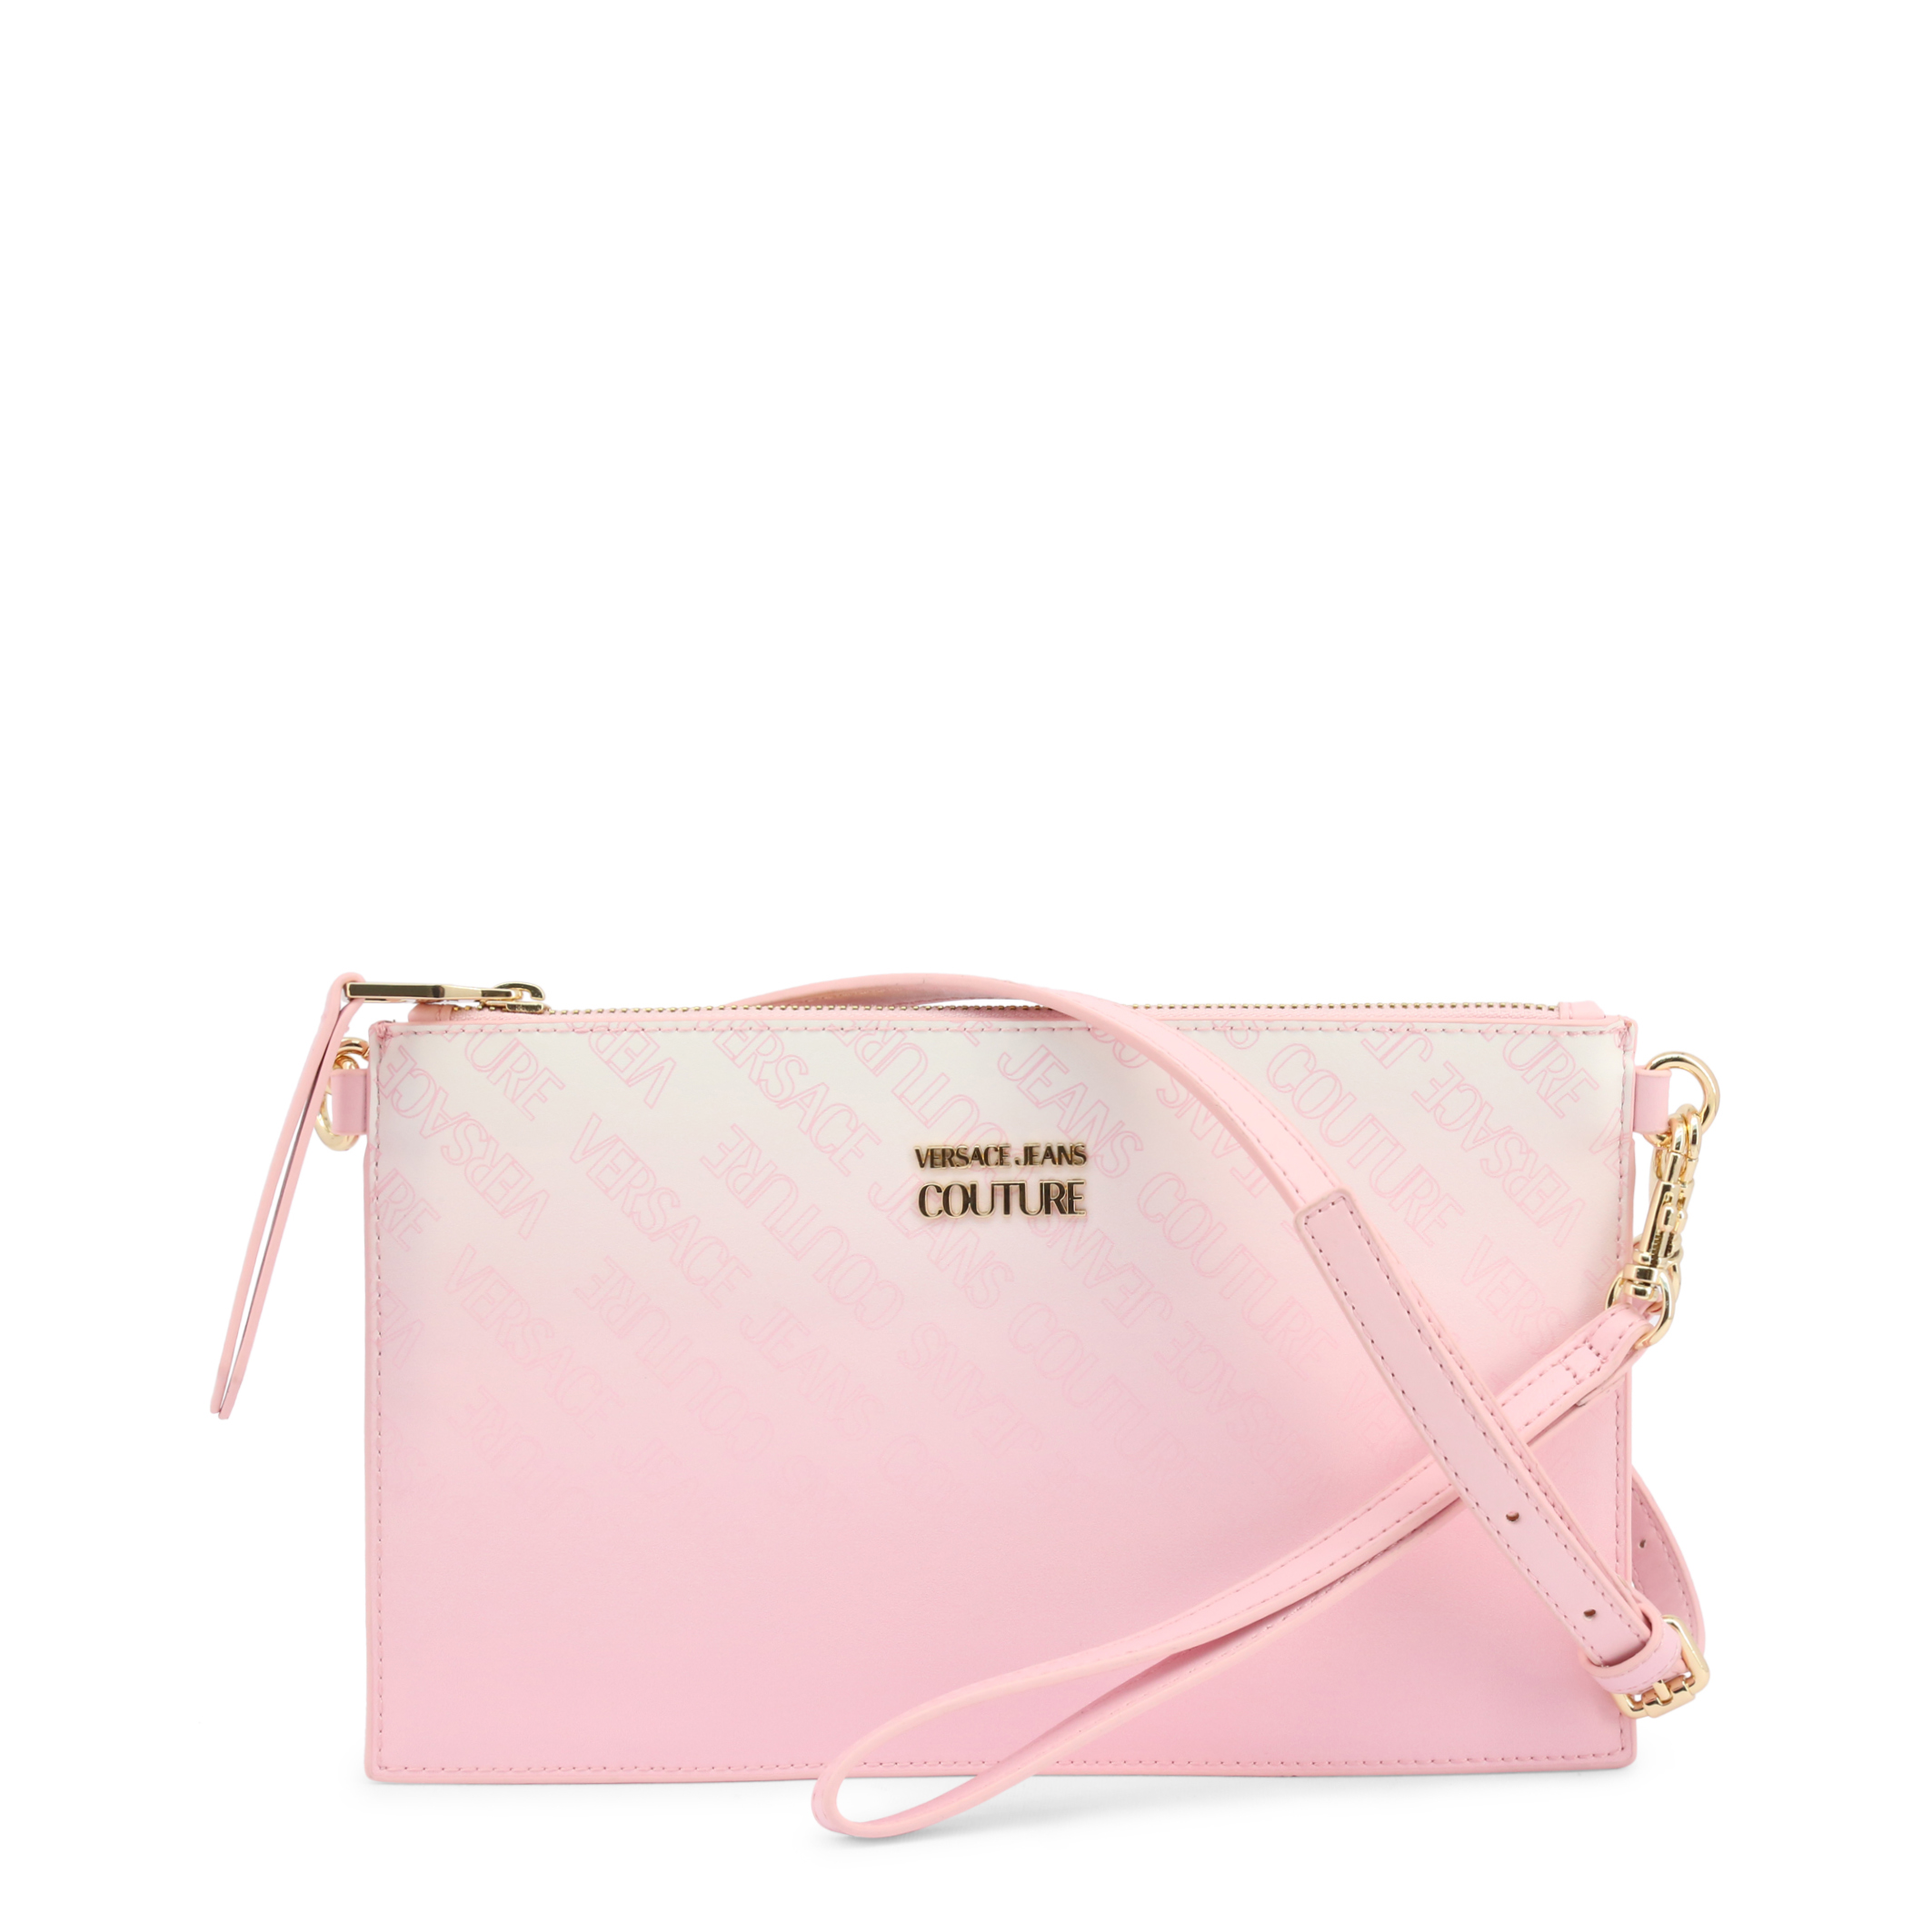 Versace Jeans - E1VWAB6X_71899 - Pink